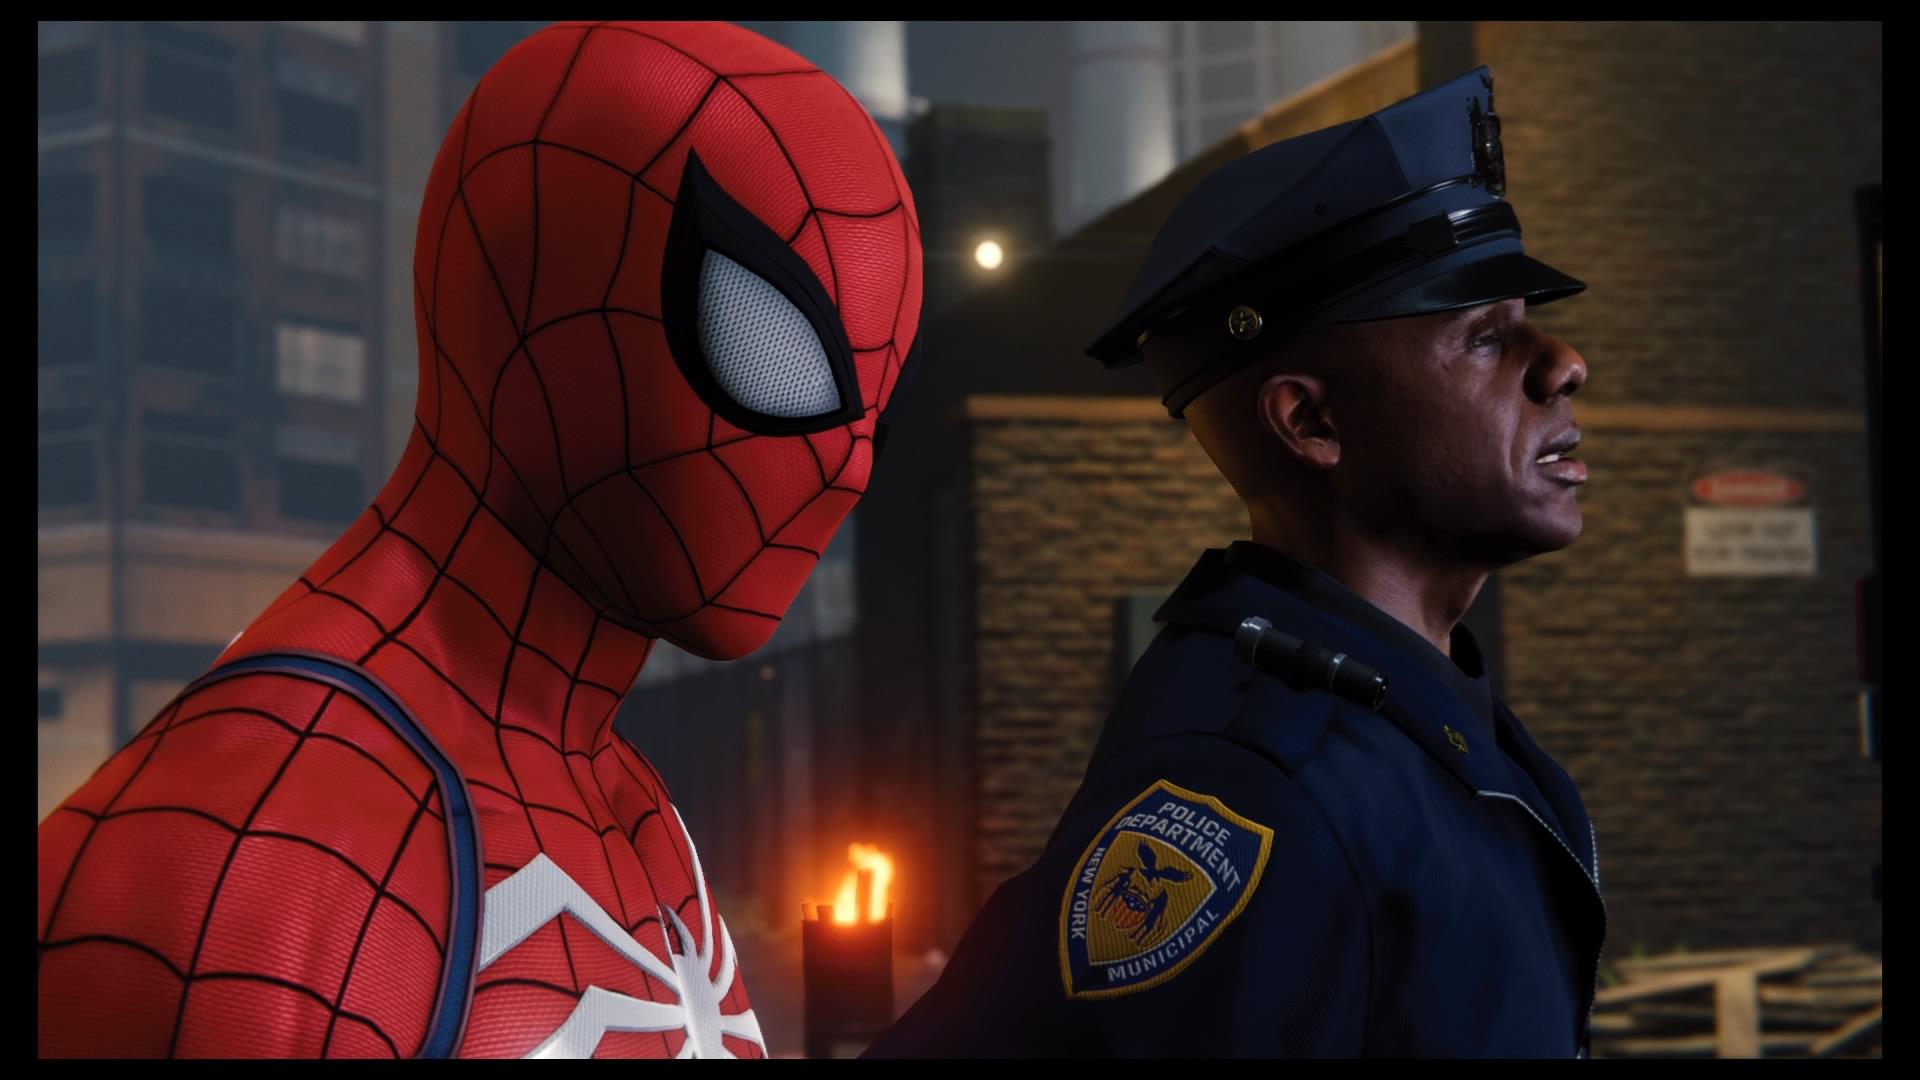 marvel_s_spider-man_20181008224327.jpg